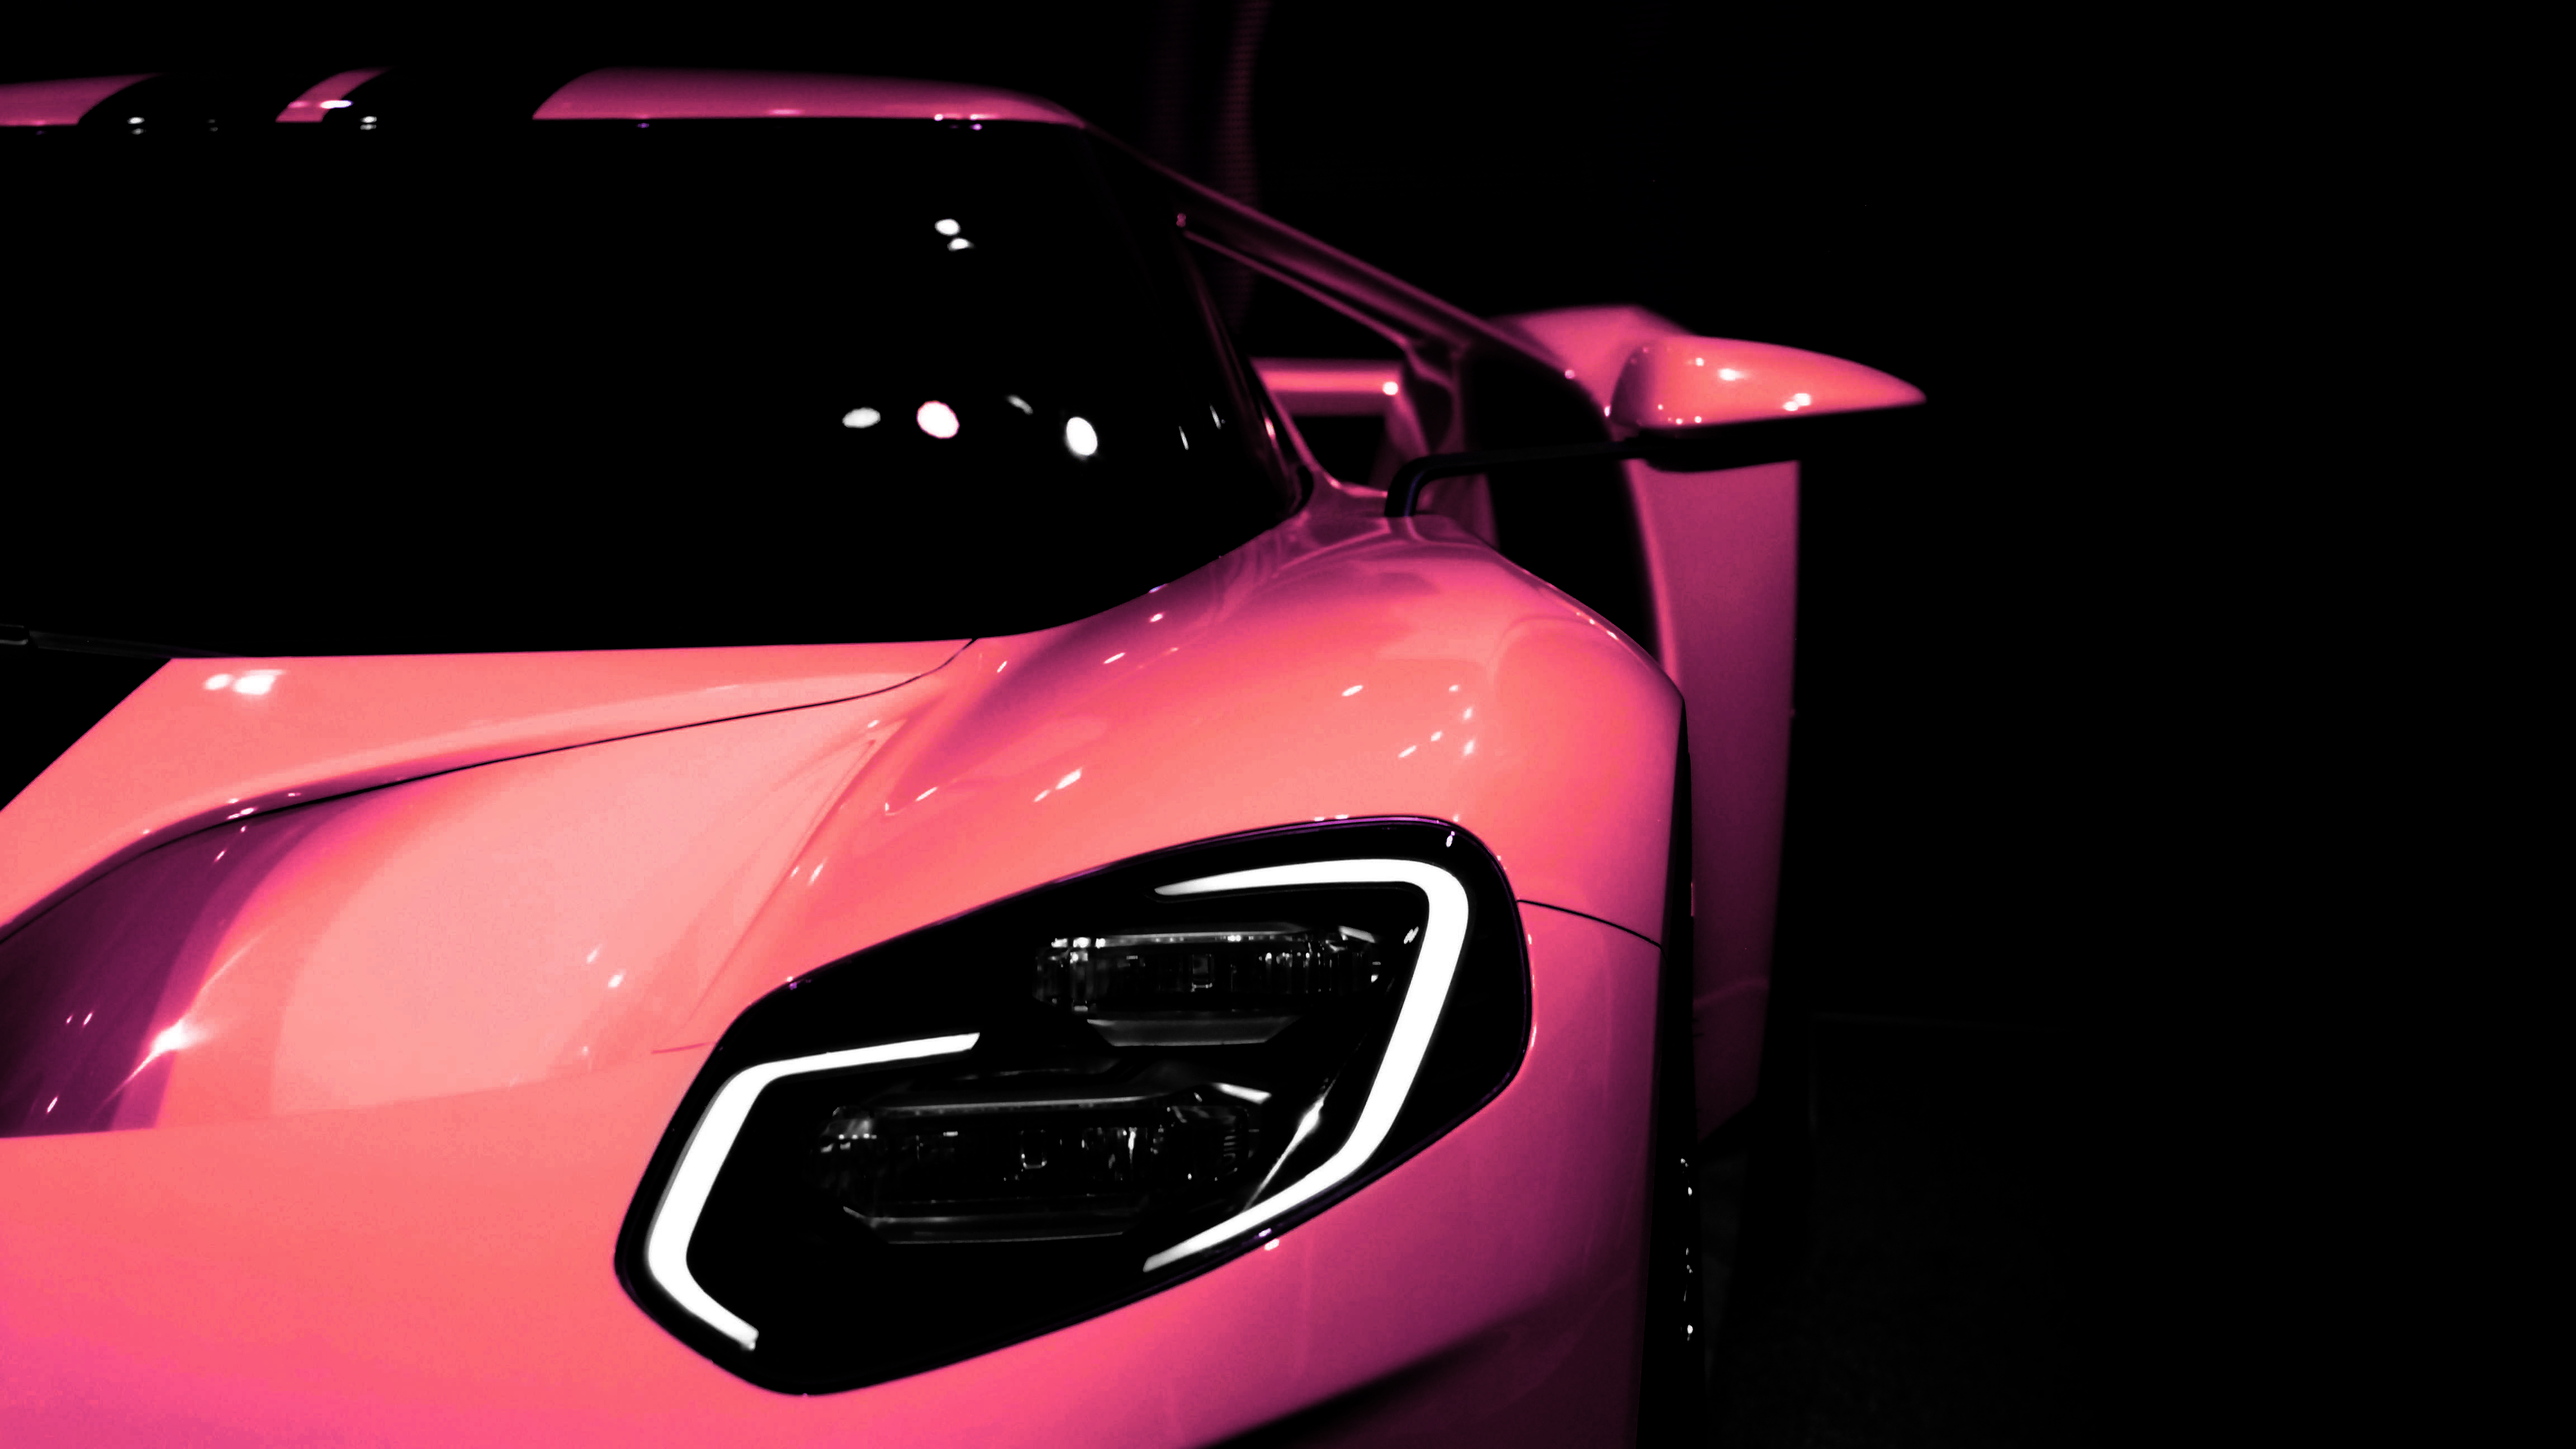 2020 Ford GT Pink by FirstLightStudios on DeviantArt